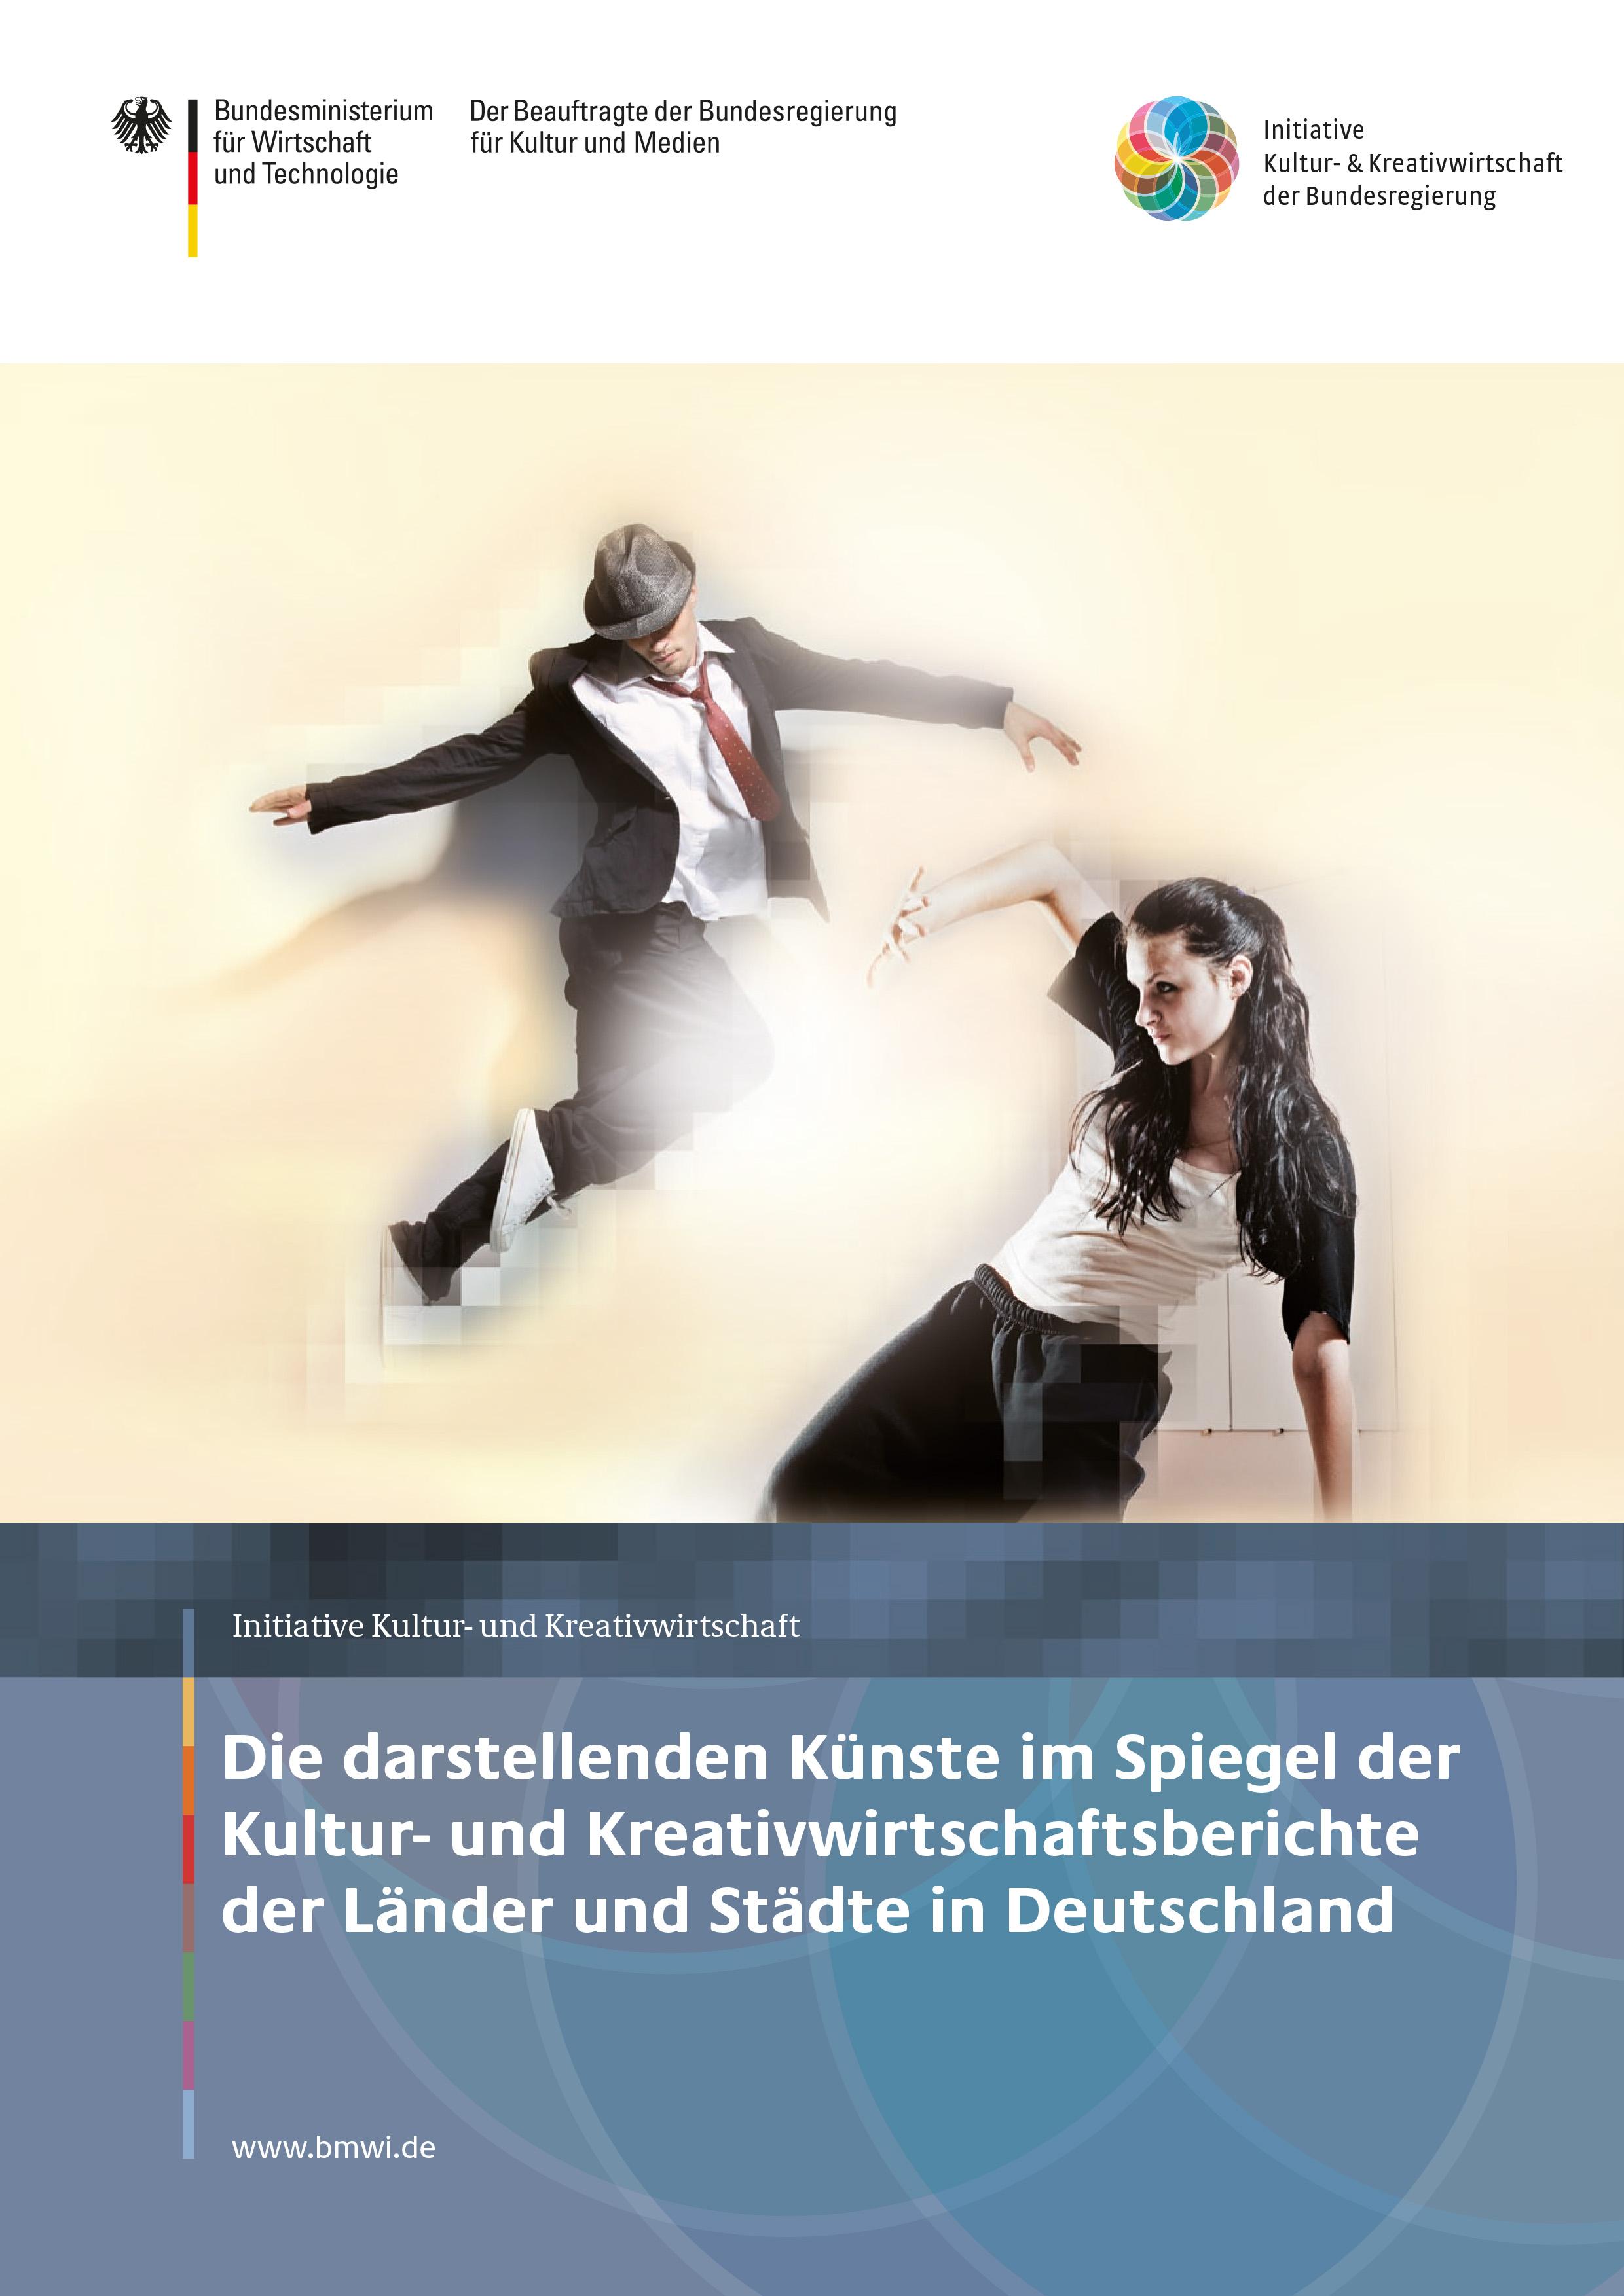 2009_DB_Dümcke_BMWi-InitiativeKKW-Bericht-Darst_Kuenste.jpg